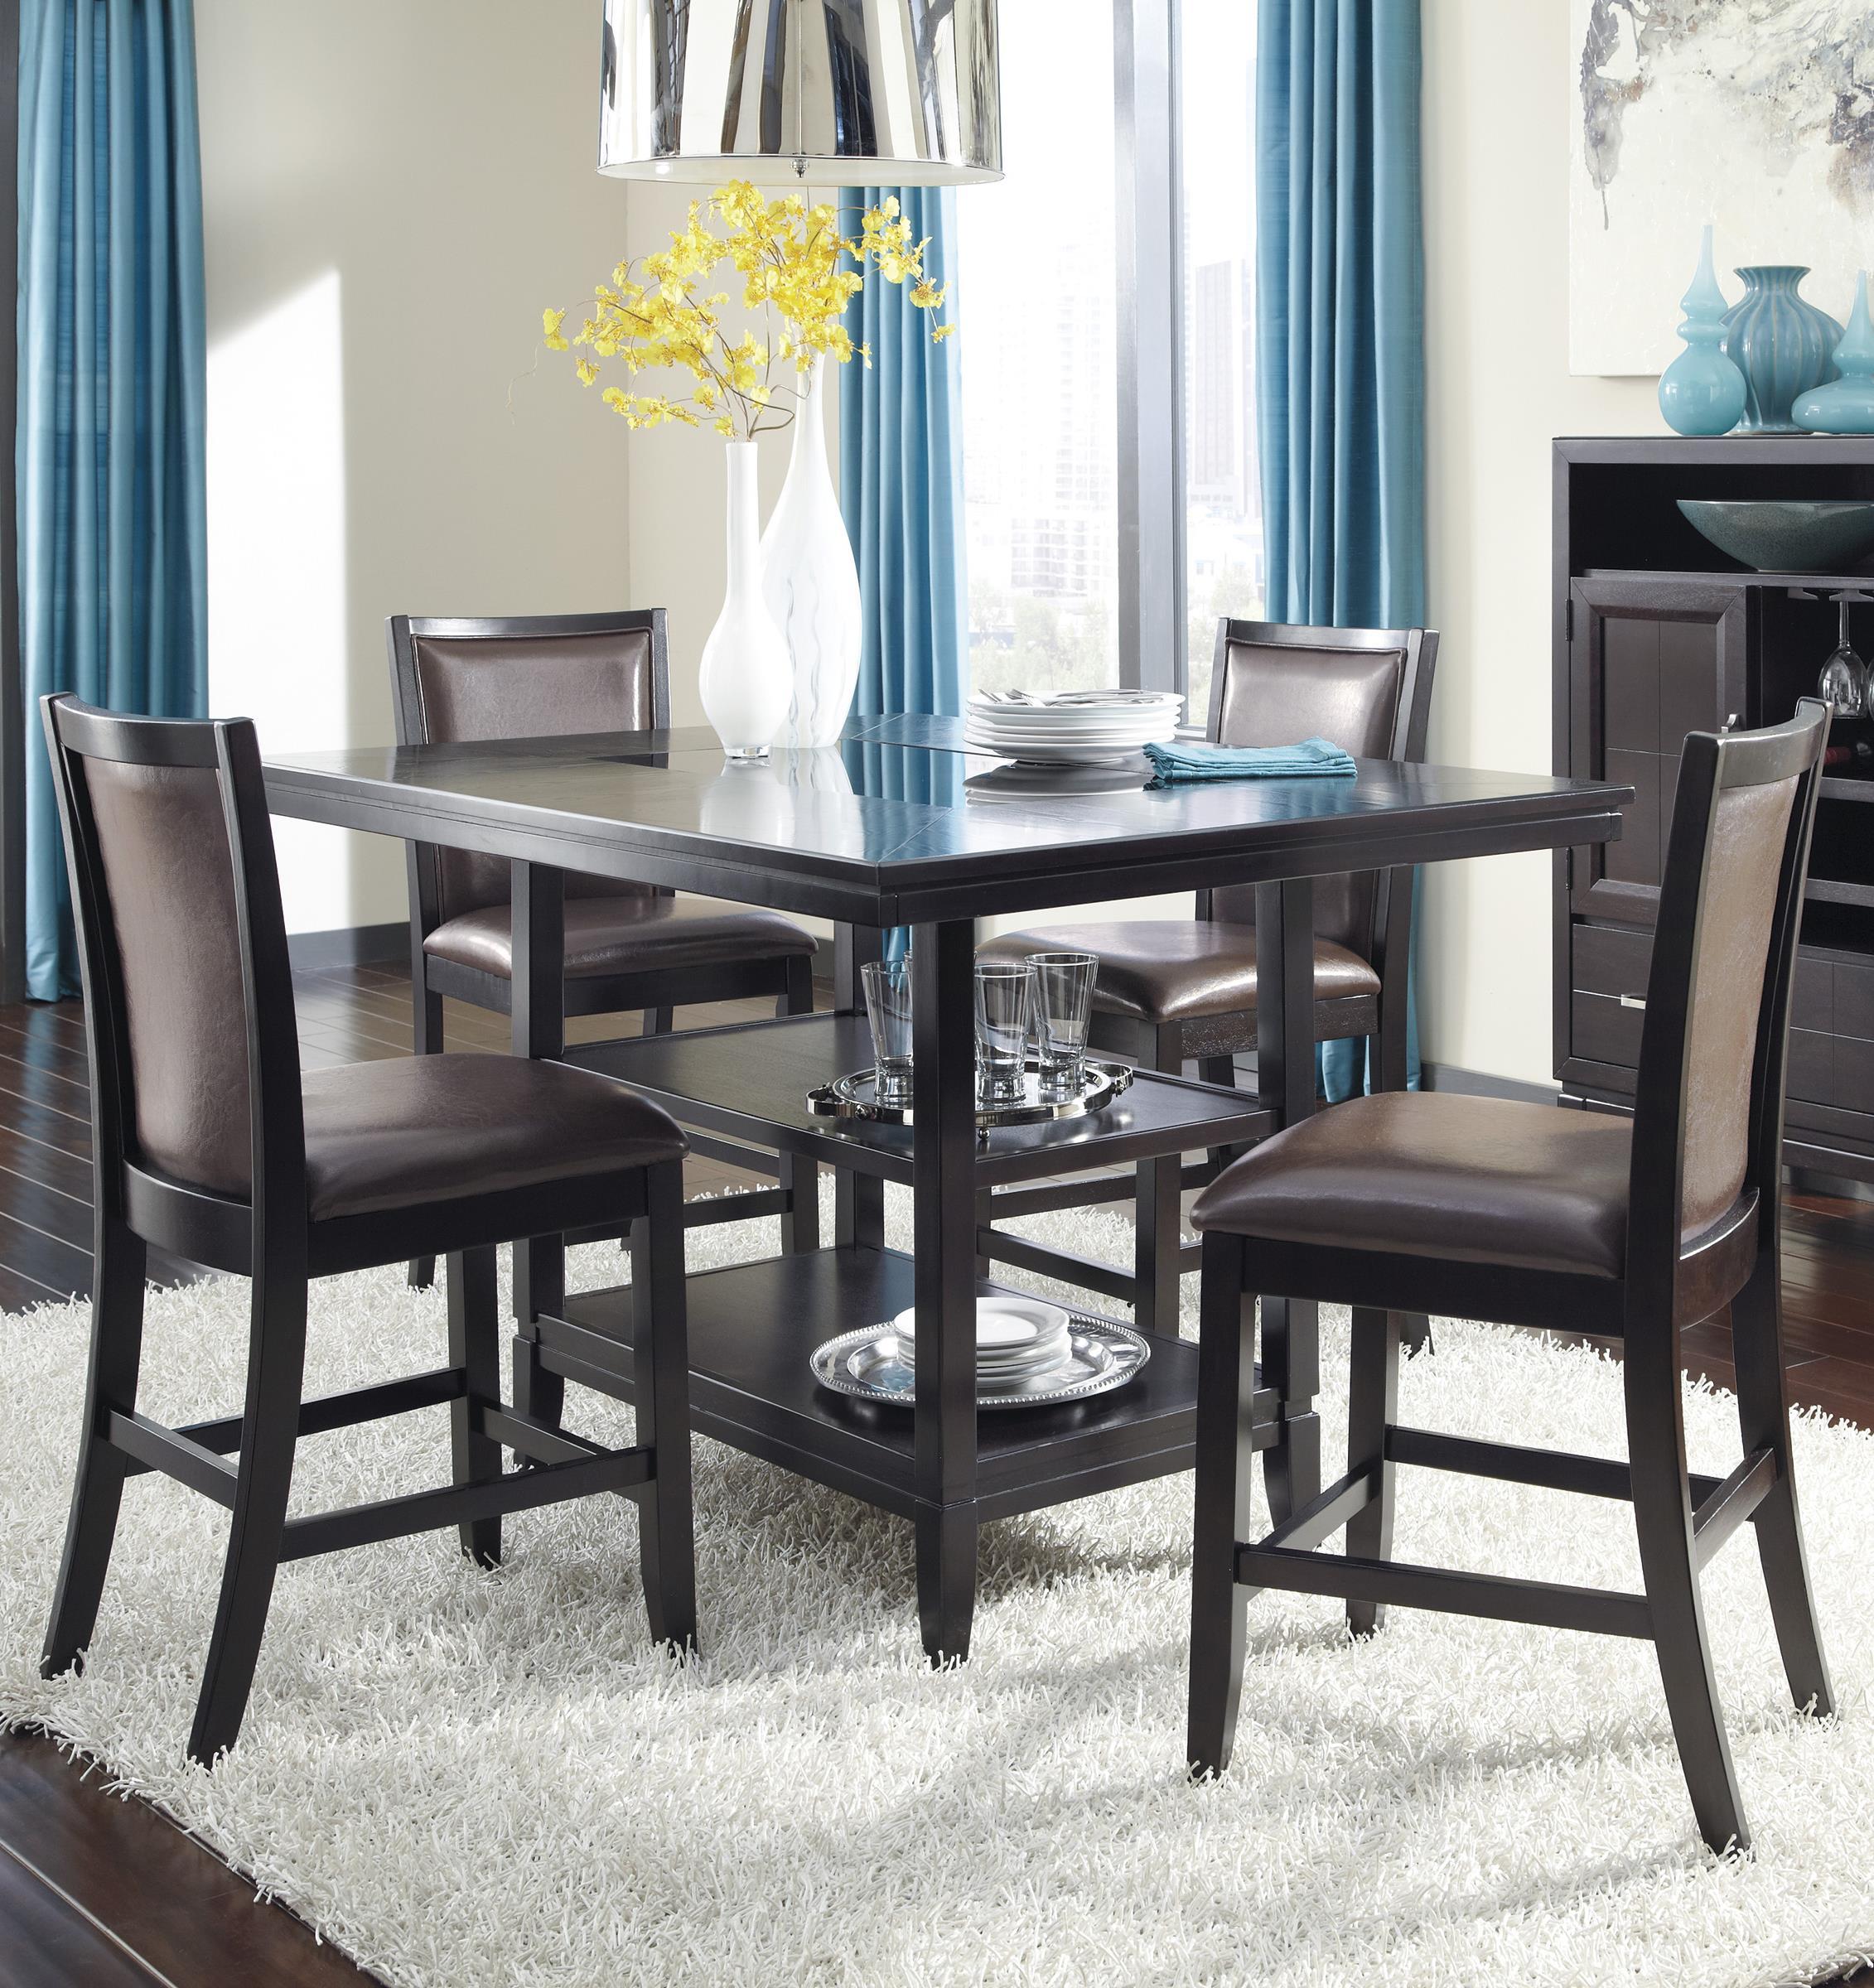 Ashley Furniture Trishelle 5-Piece Counter Table Set - Item Number: D550-32+4x224